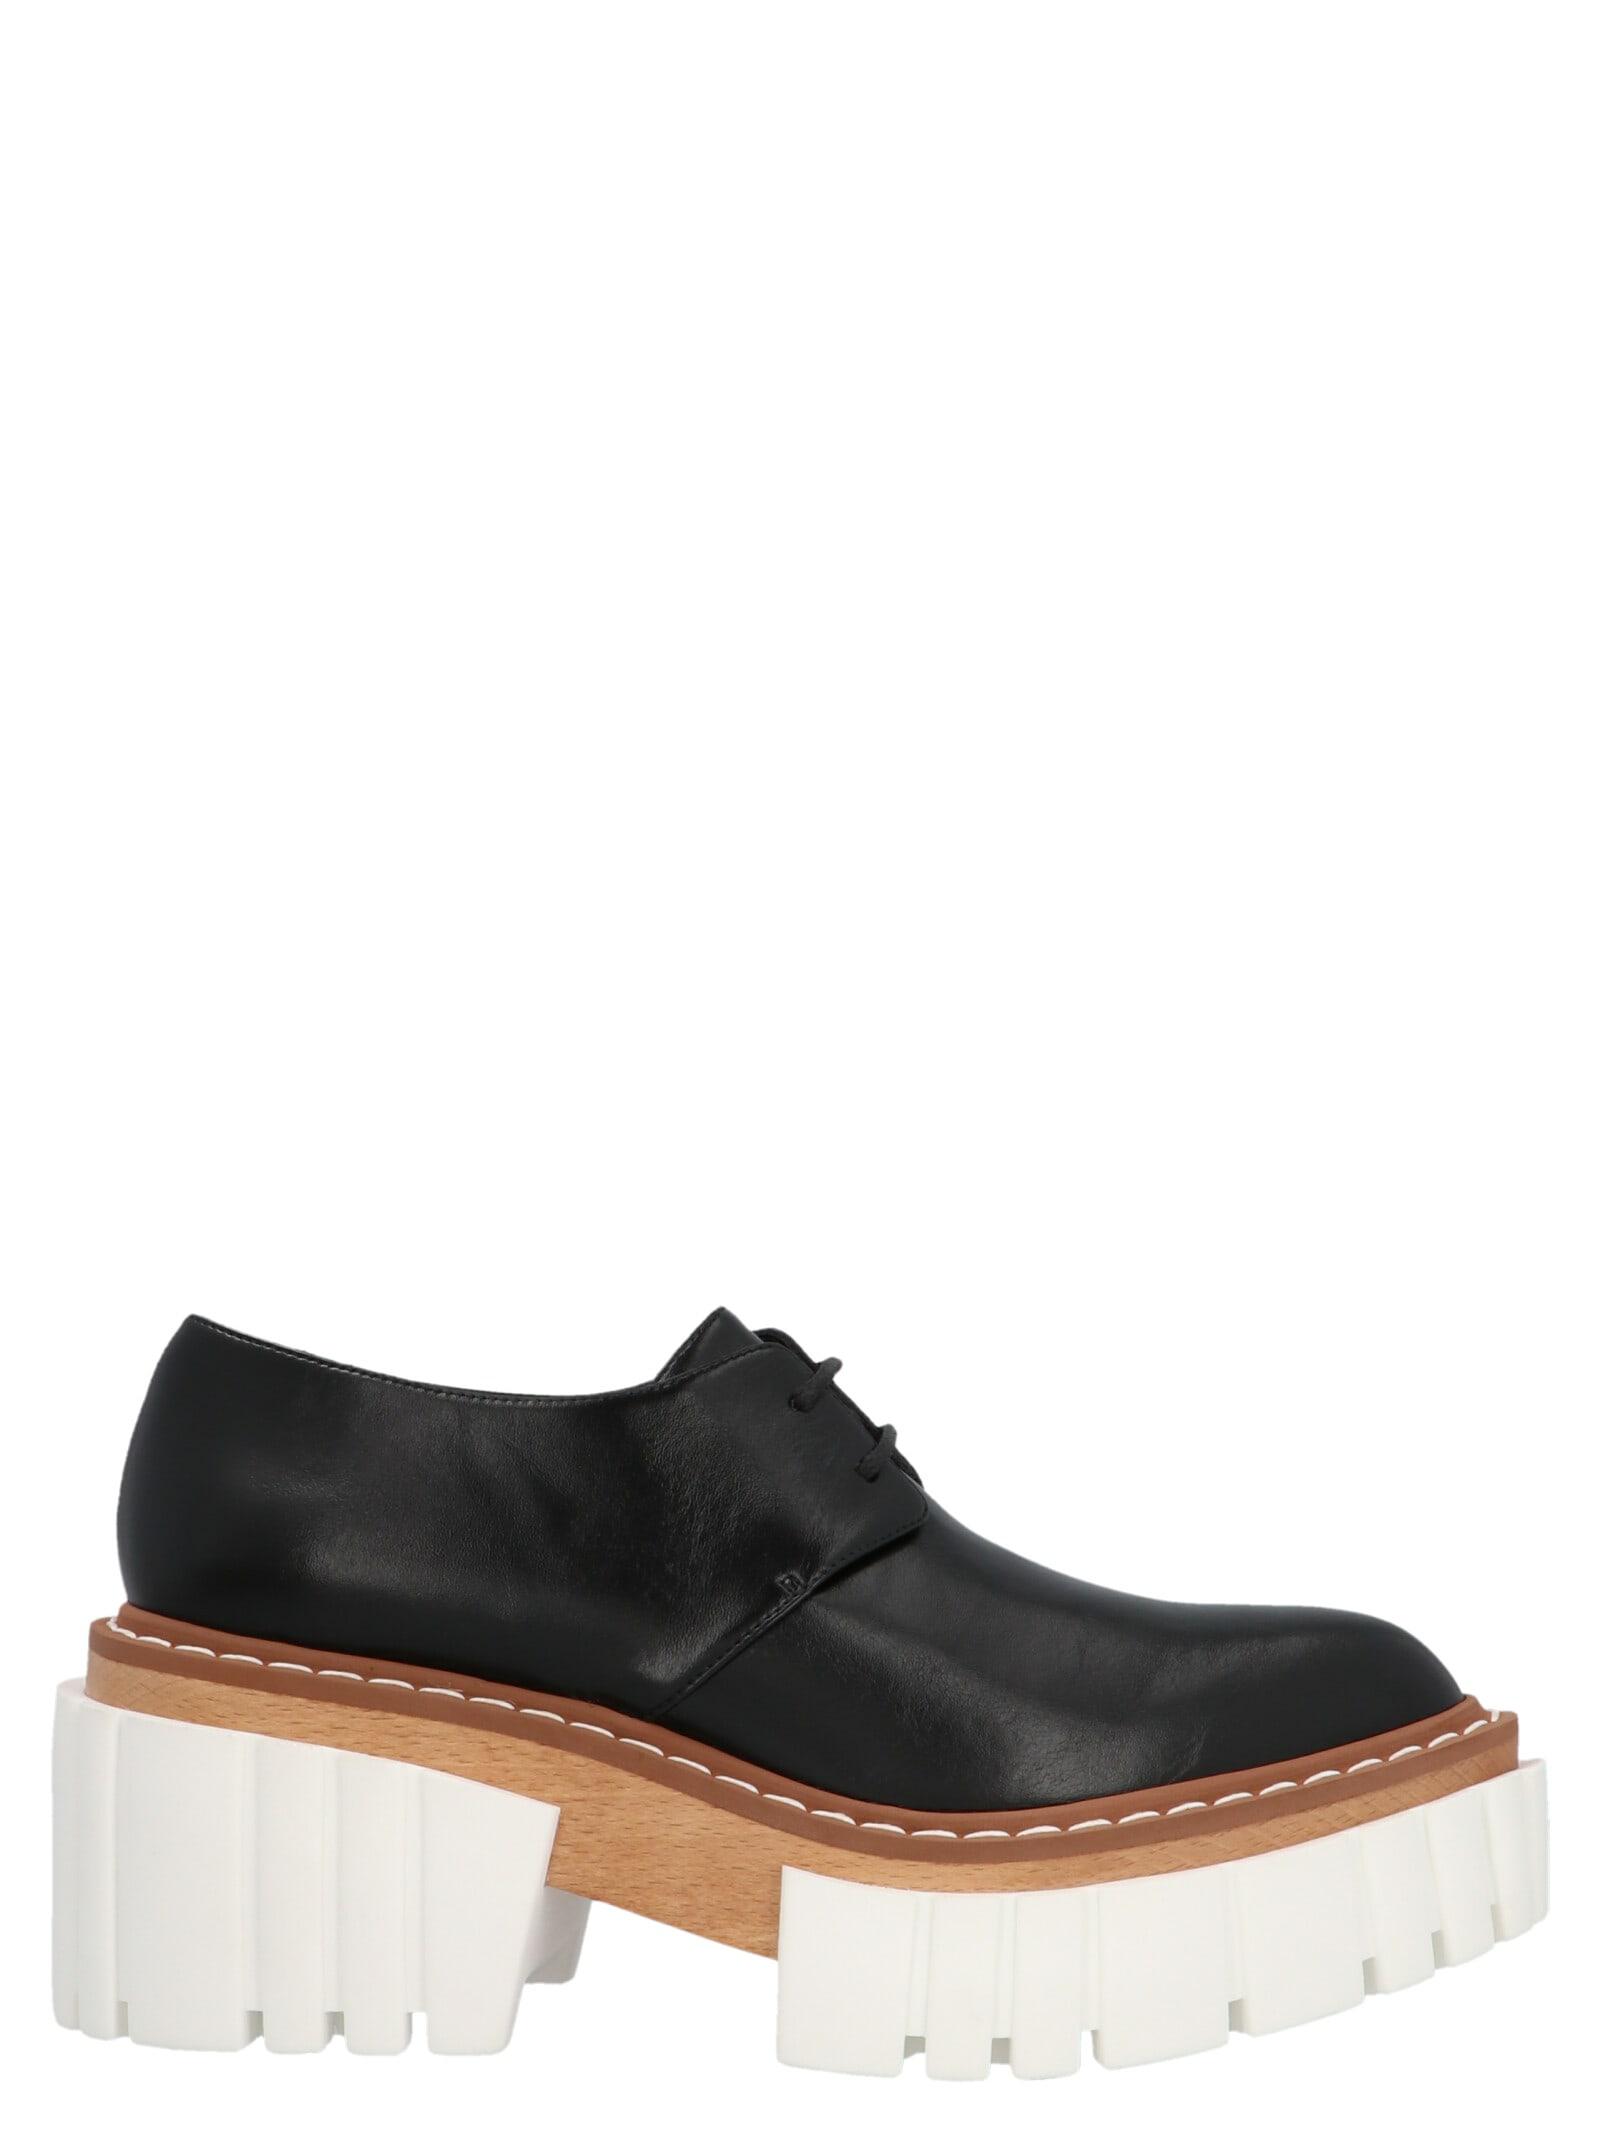 Buy Stella Mccartney emilie Shoes online, shop Stella McCartney shoes with free shipping